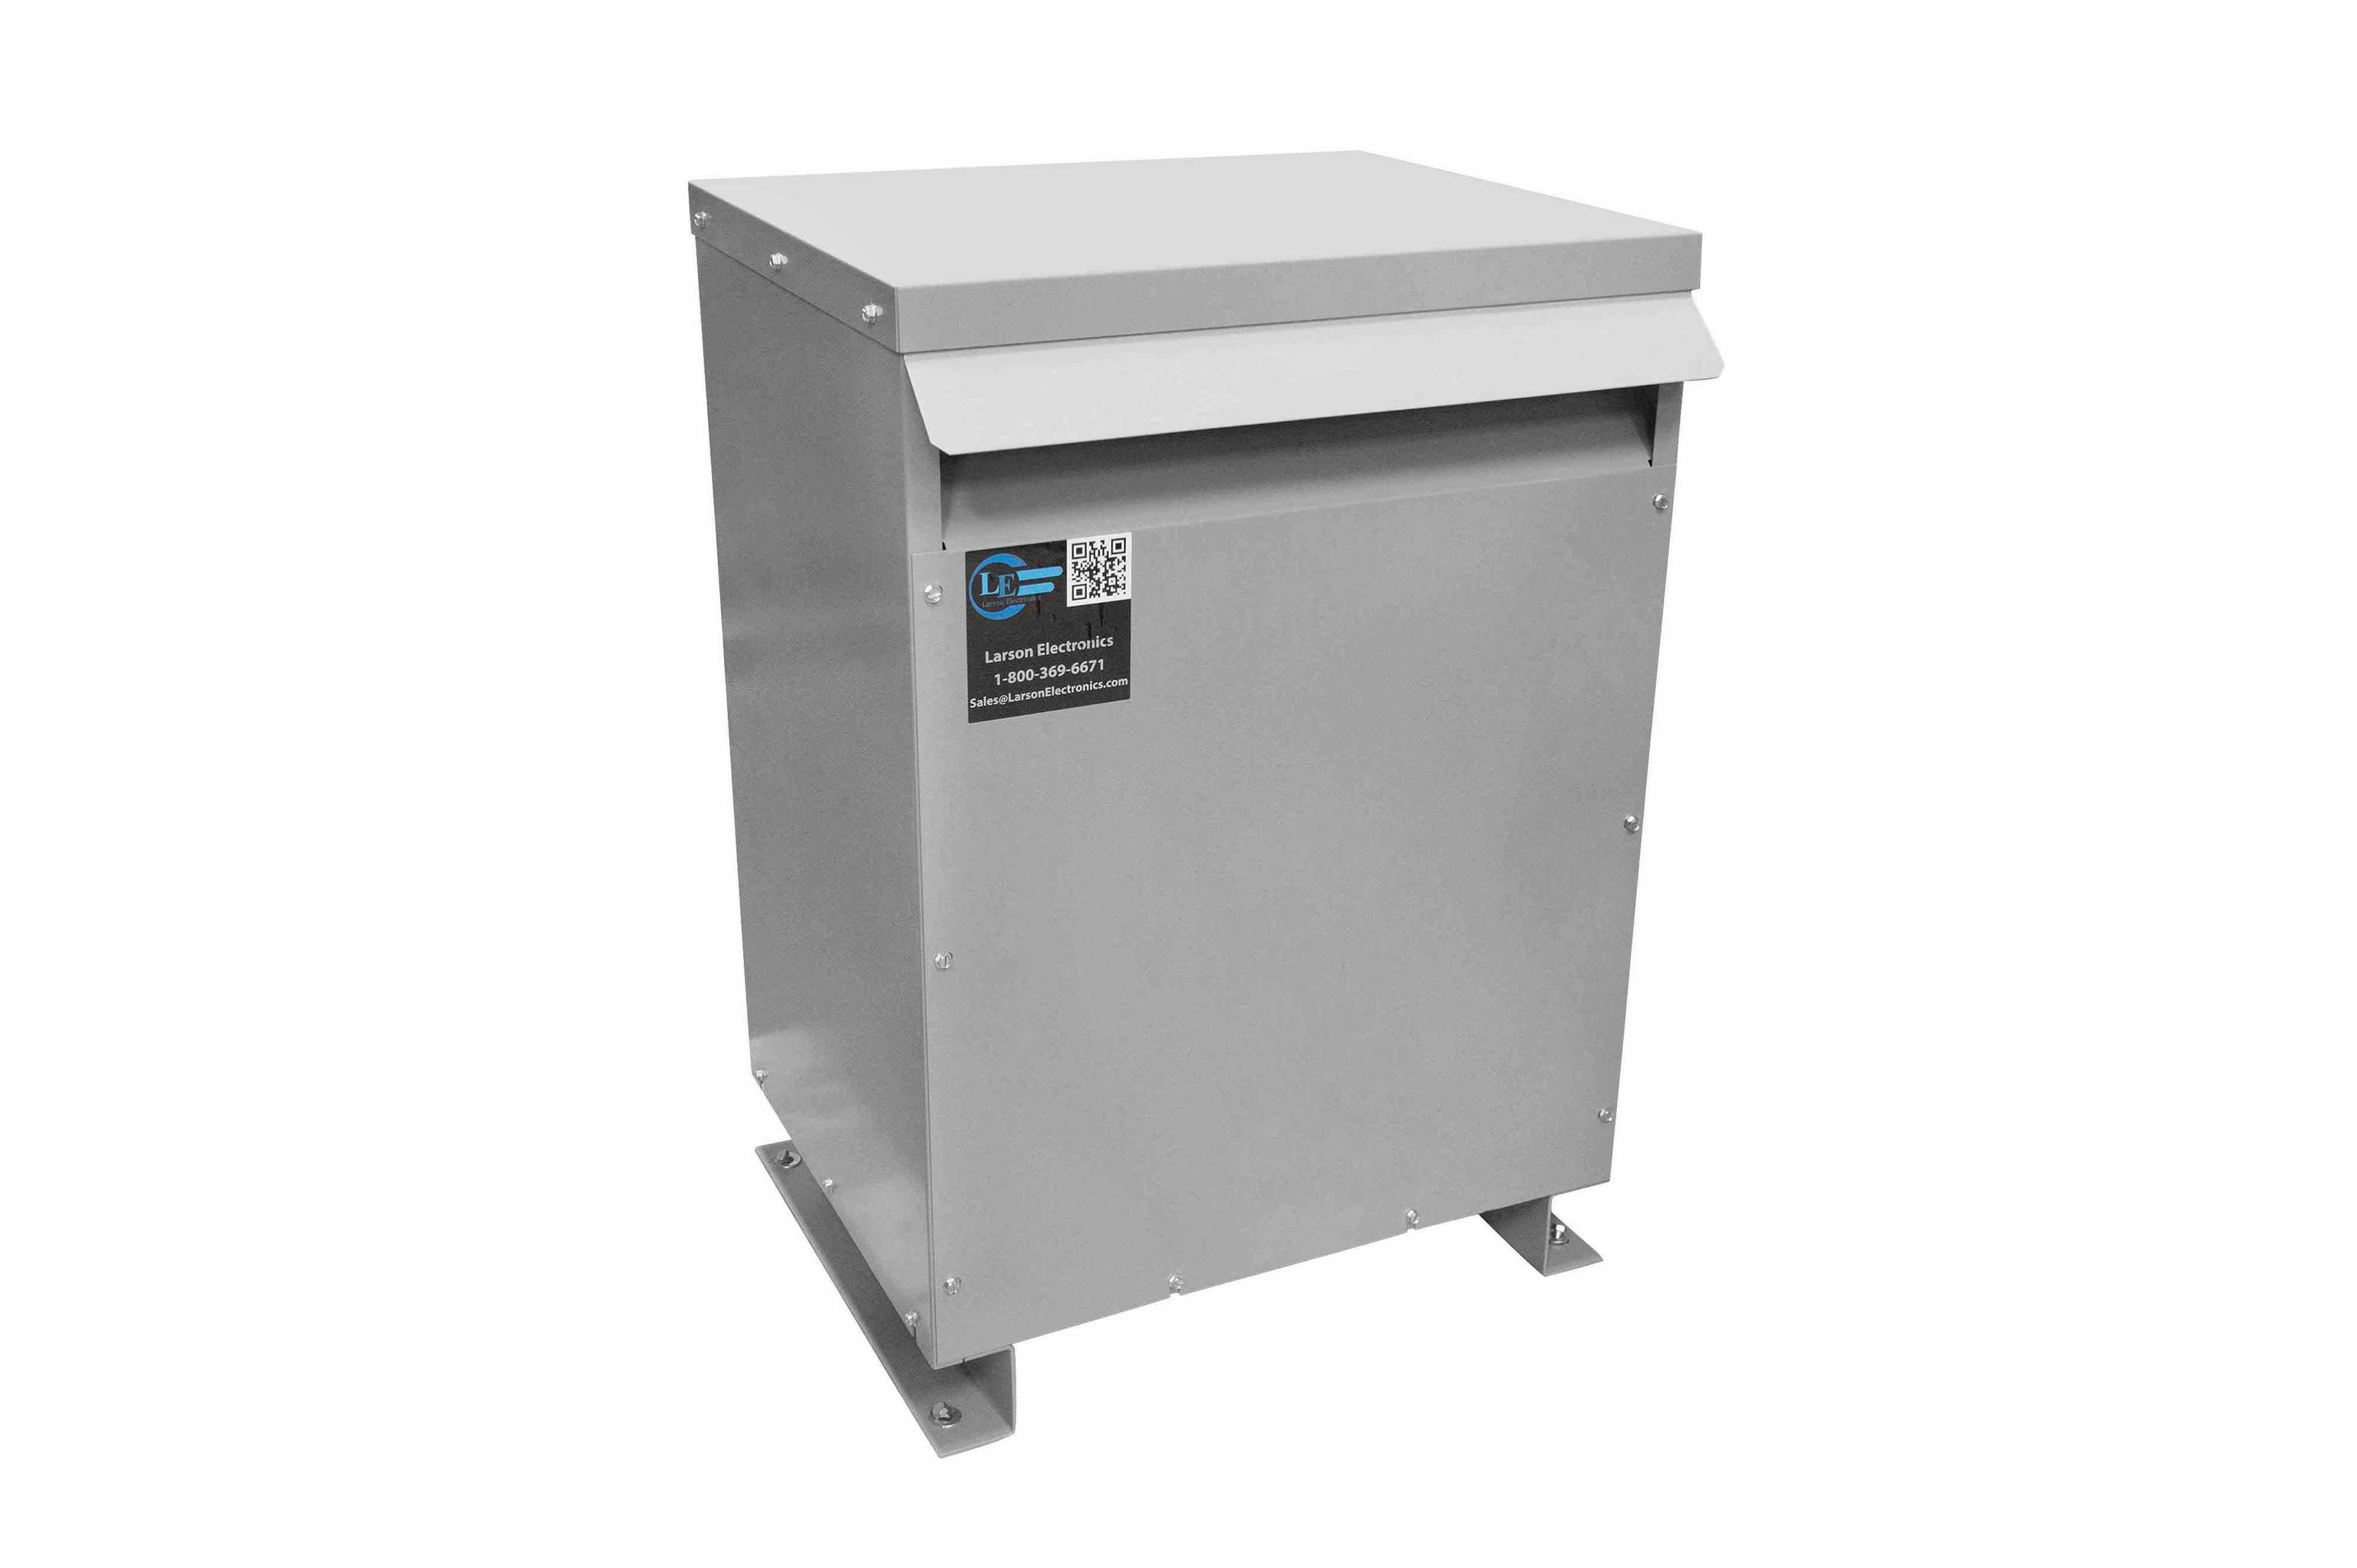 150 kVA 3PH Isolation Transformer, 480V Wye Primary, 480Y/277 Wye-N Secondary, N3R, Ventilated, 60 Hz